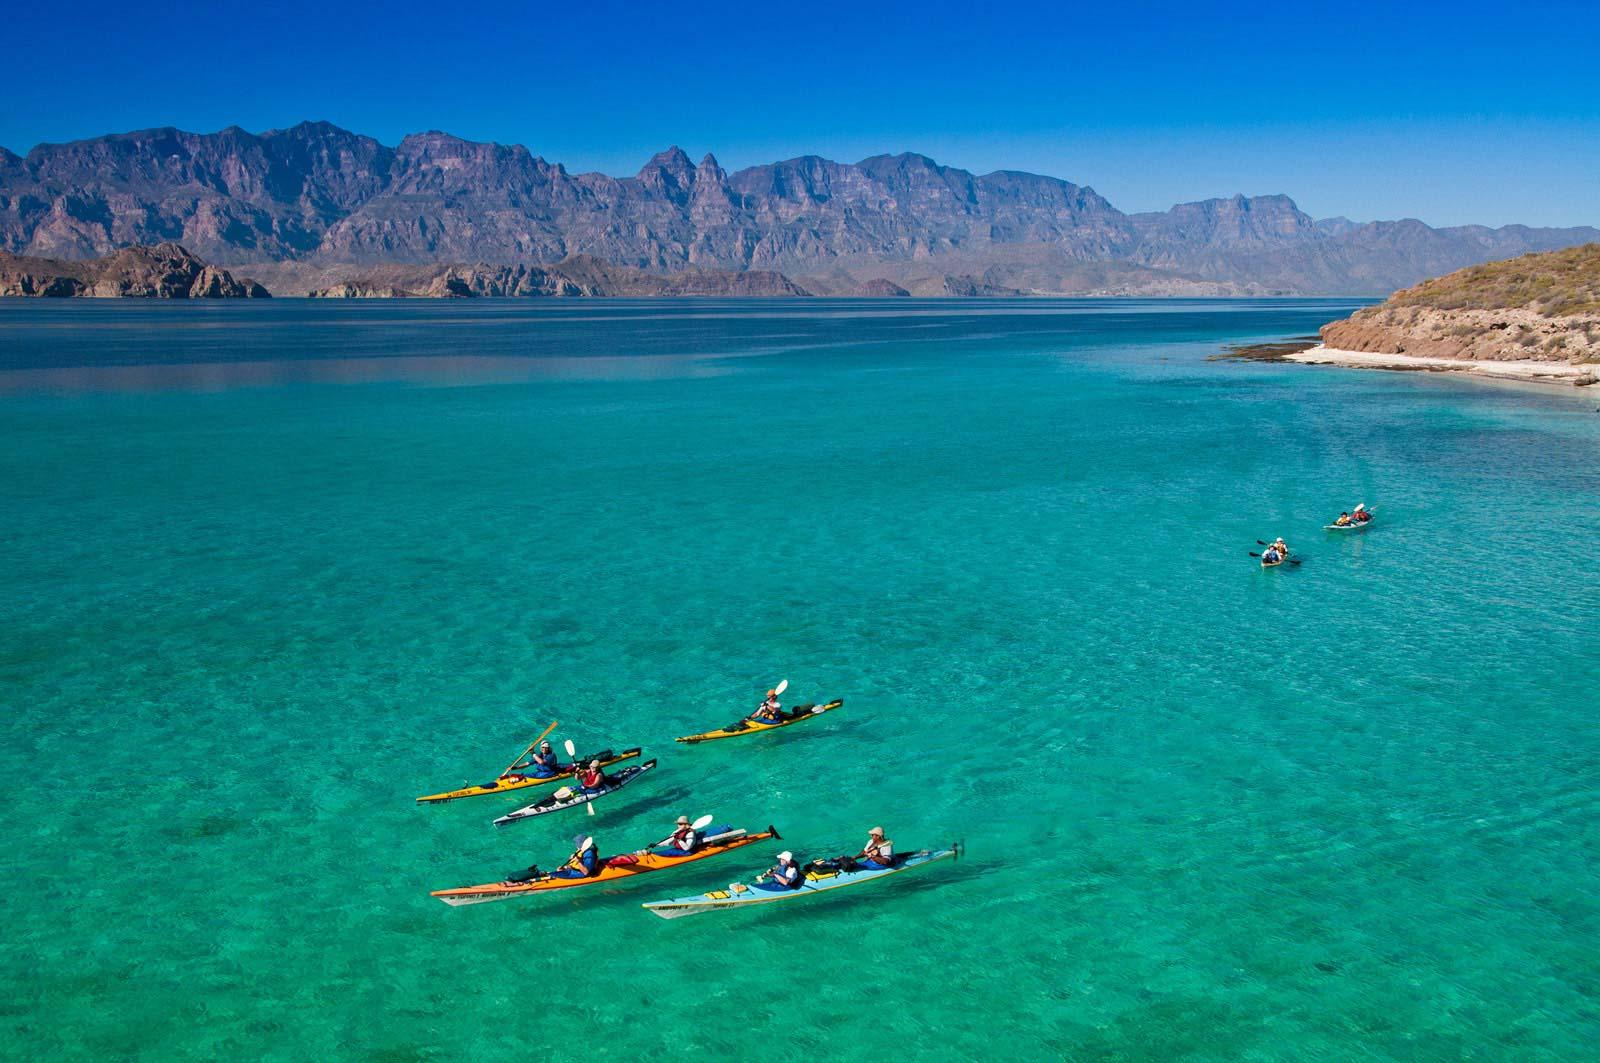 Baja Mexico Kayaking Tours